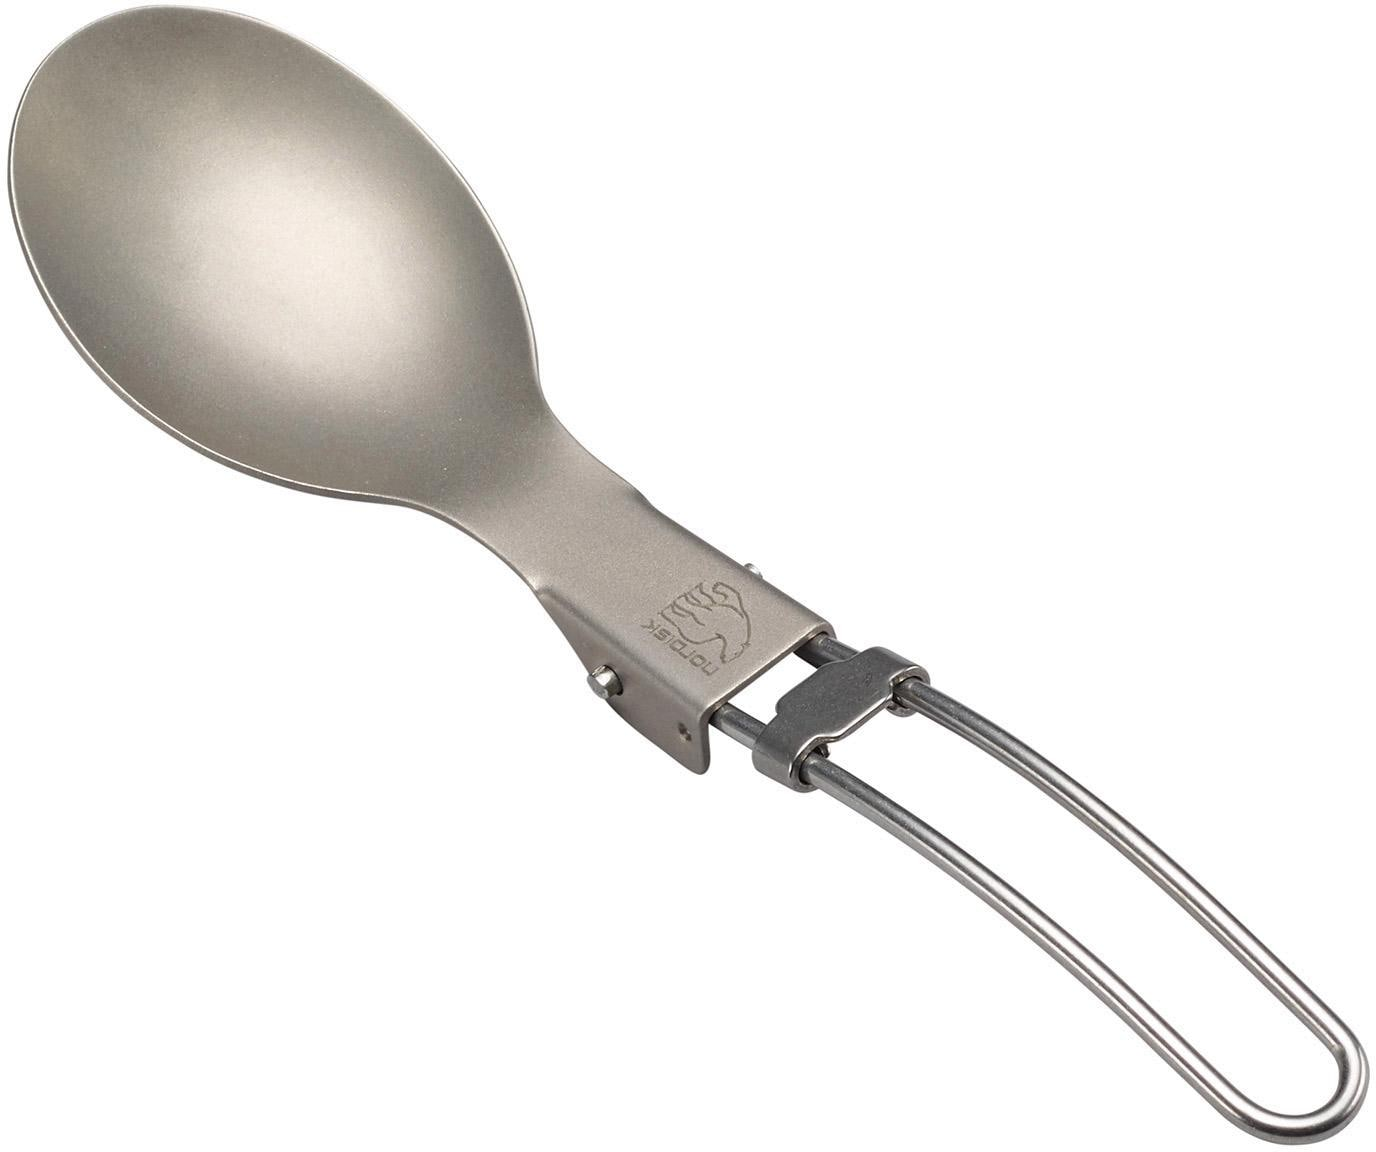 Nordisk Single Geschirr-Set Titan Spoon silberfarben Geschirr-Sets Geschirr, Porzellan Tischaccessoires Haushaltswaren